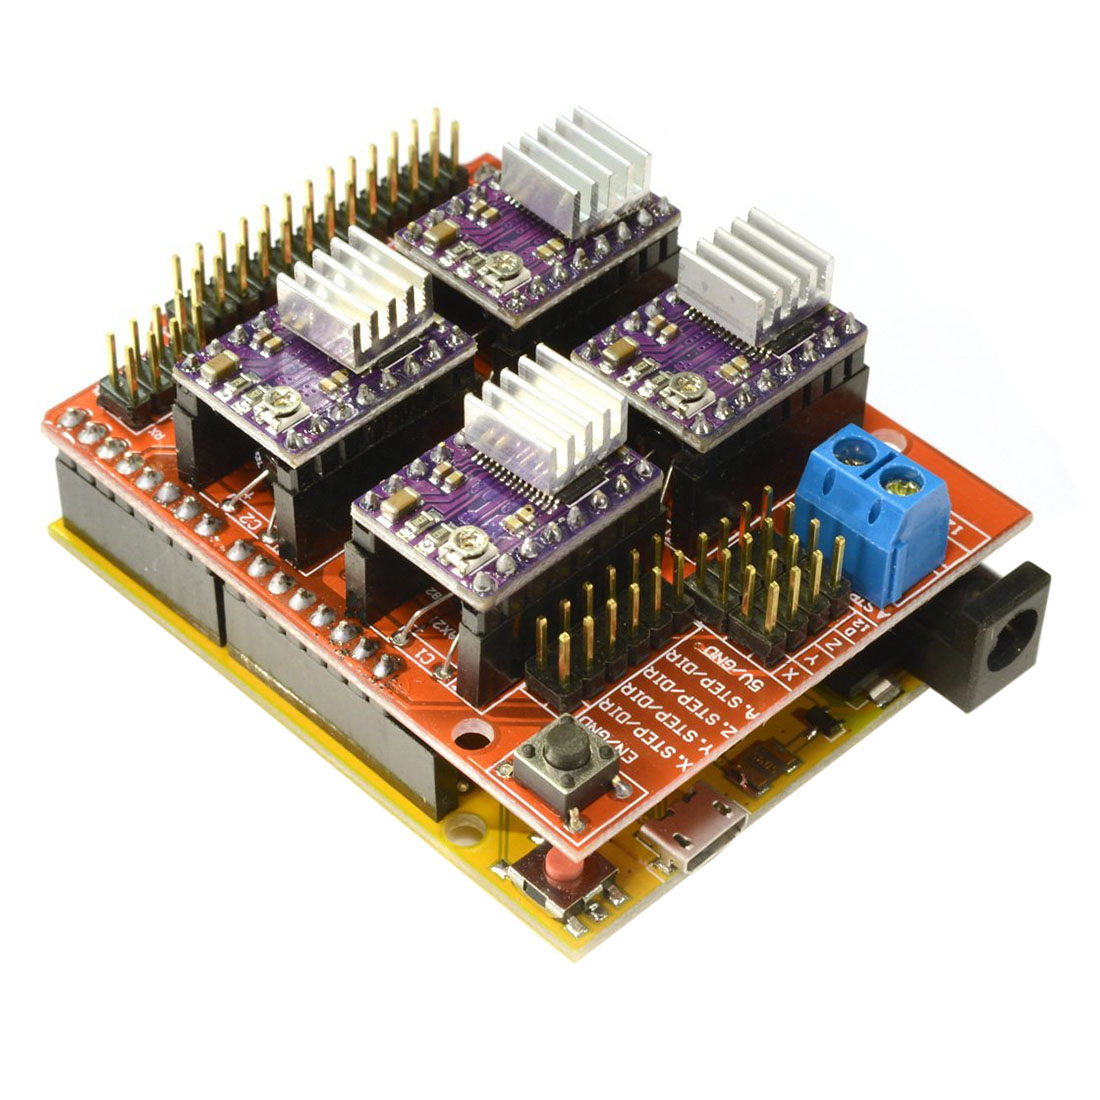 CNC V3 Shield + UNO R3 for Arduino Compatible Board + 4x TI DRV8825 StepStick Stepper Drivers Red+purple cnc shield expansion board v3 0 4pcs a4988 drv8825 stepper motor driver with heatsink with uno r3 board for arduino kits